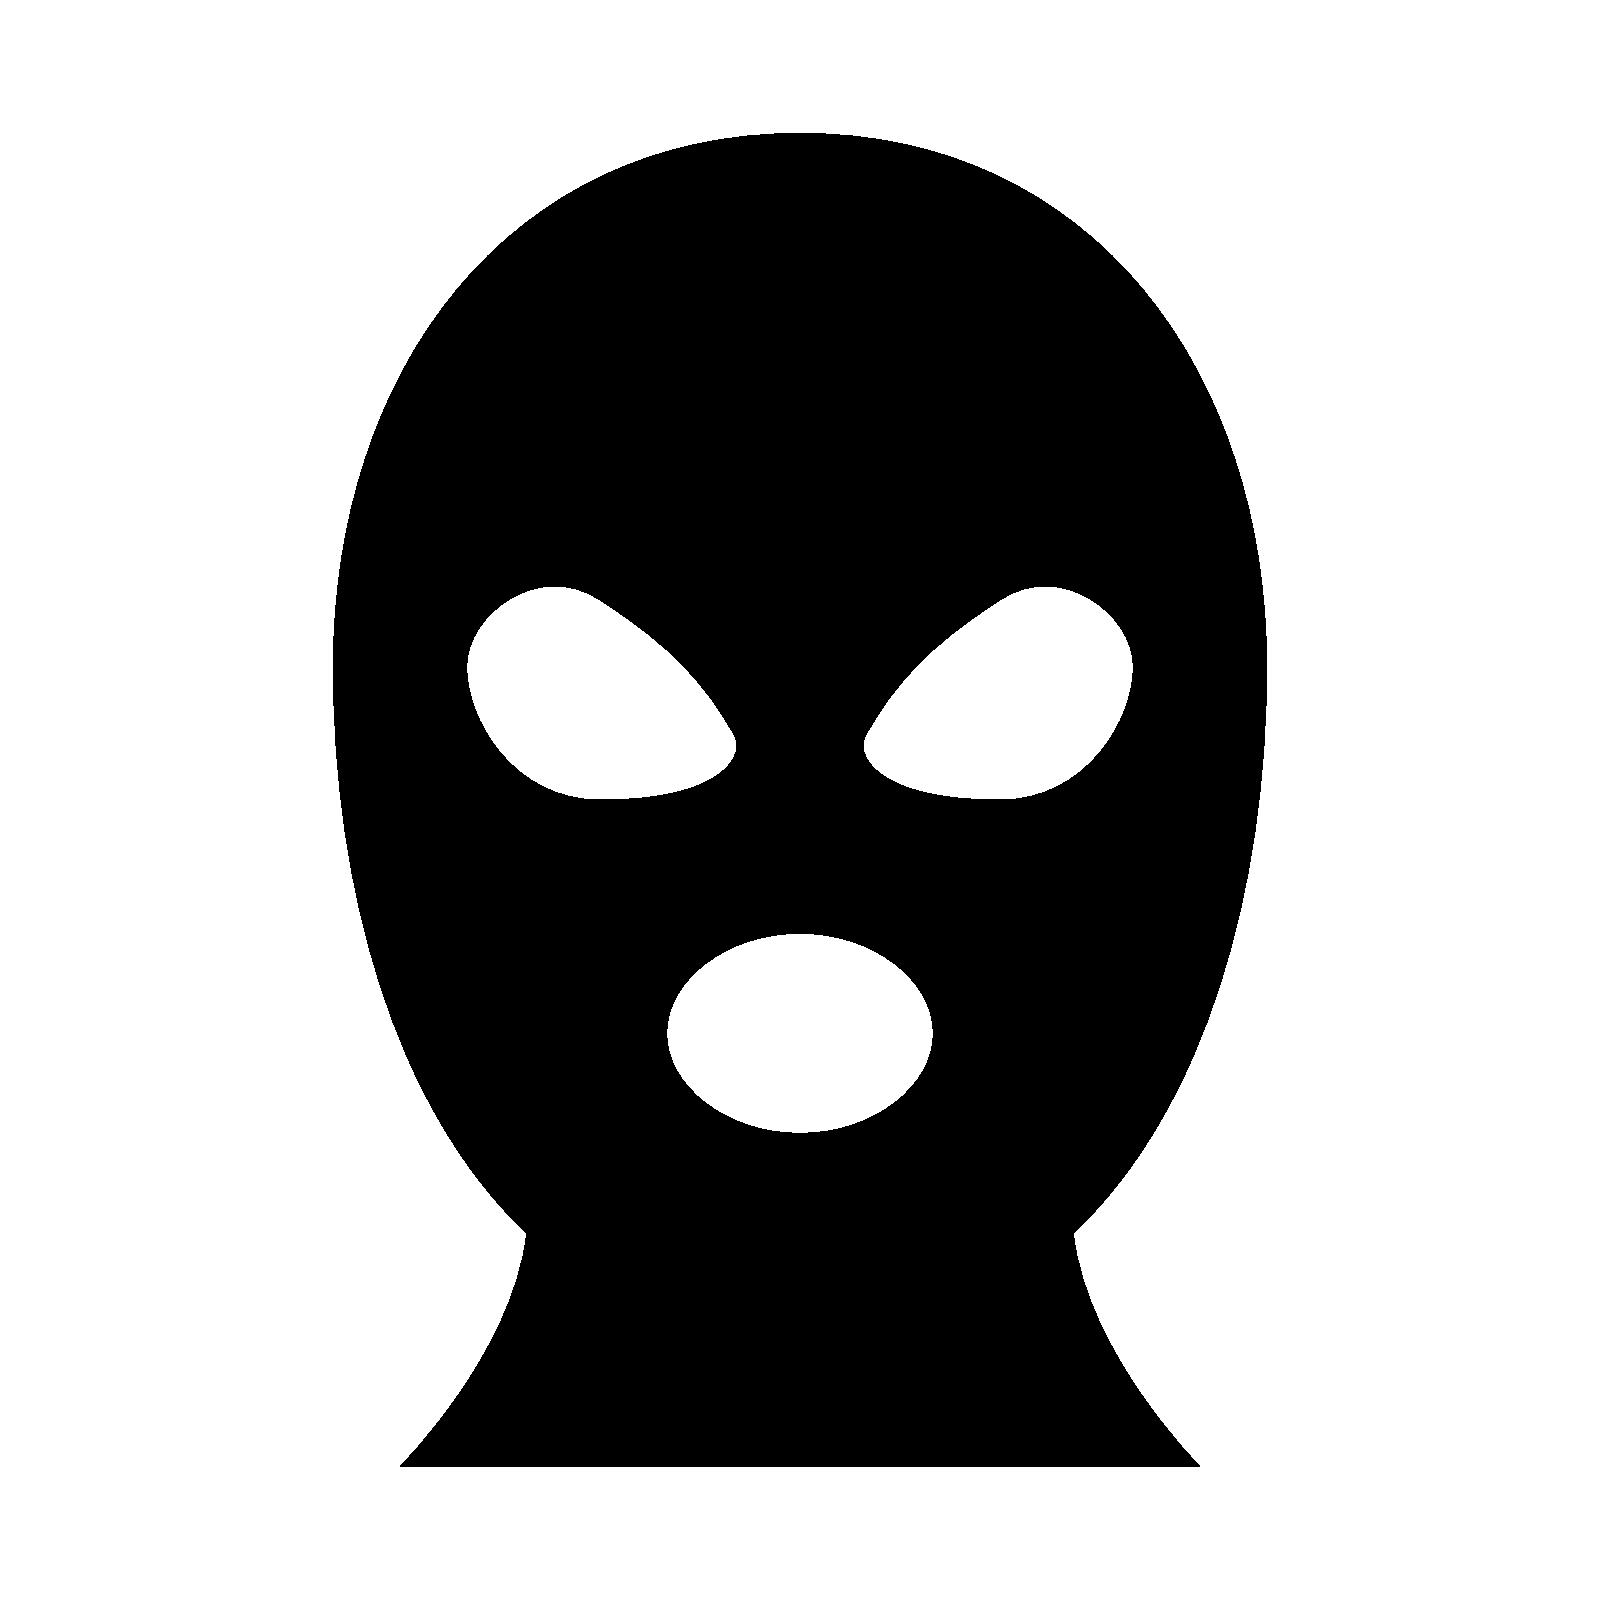 Mask clipart burglar Mask at Mask Ski Icon